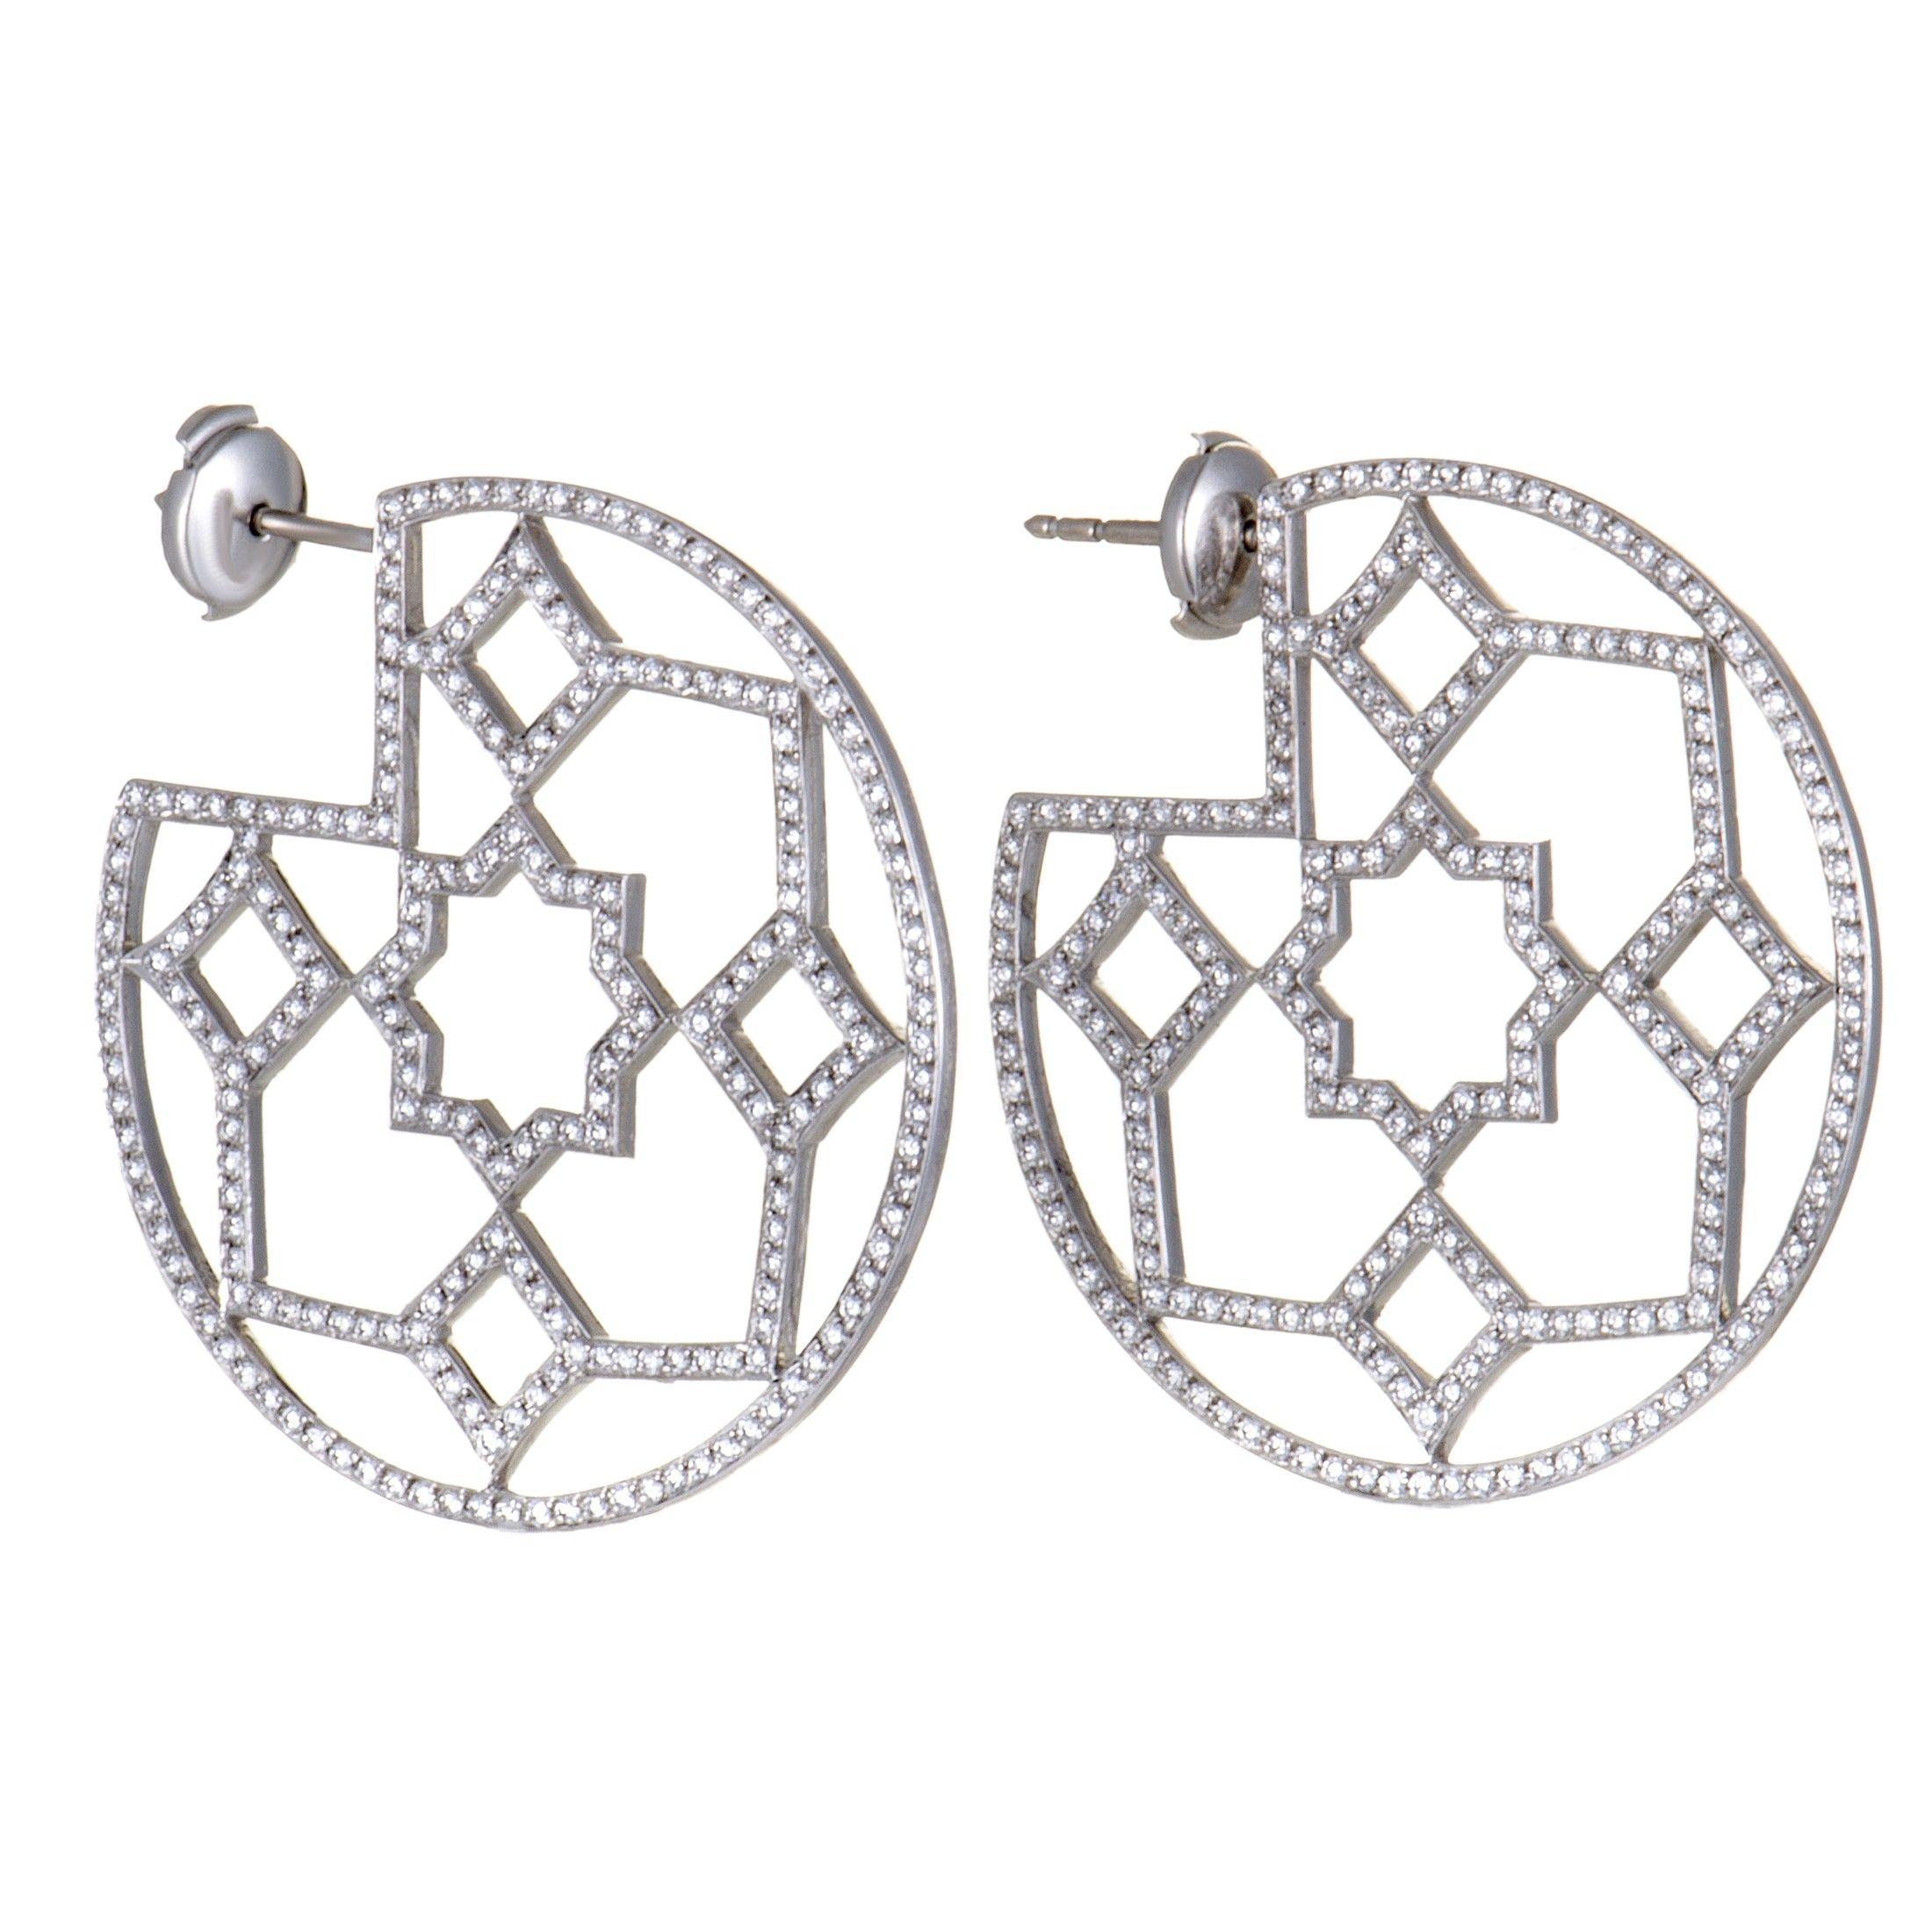 46574e9d0 Tiffany & Co. Paloma Picasso Marrakesh Platinum Diamond Pave Hoop Earrings  | Luxury Bazaar | www.luxurybazaar.com